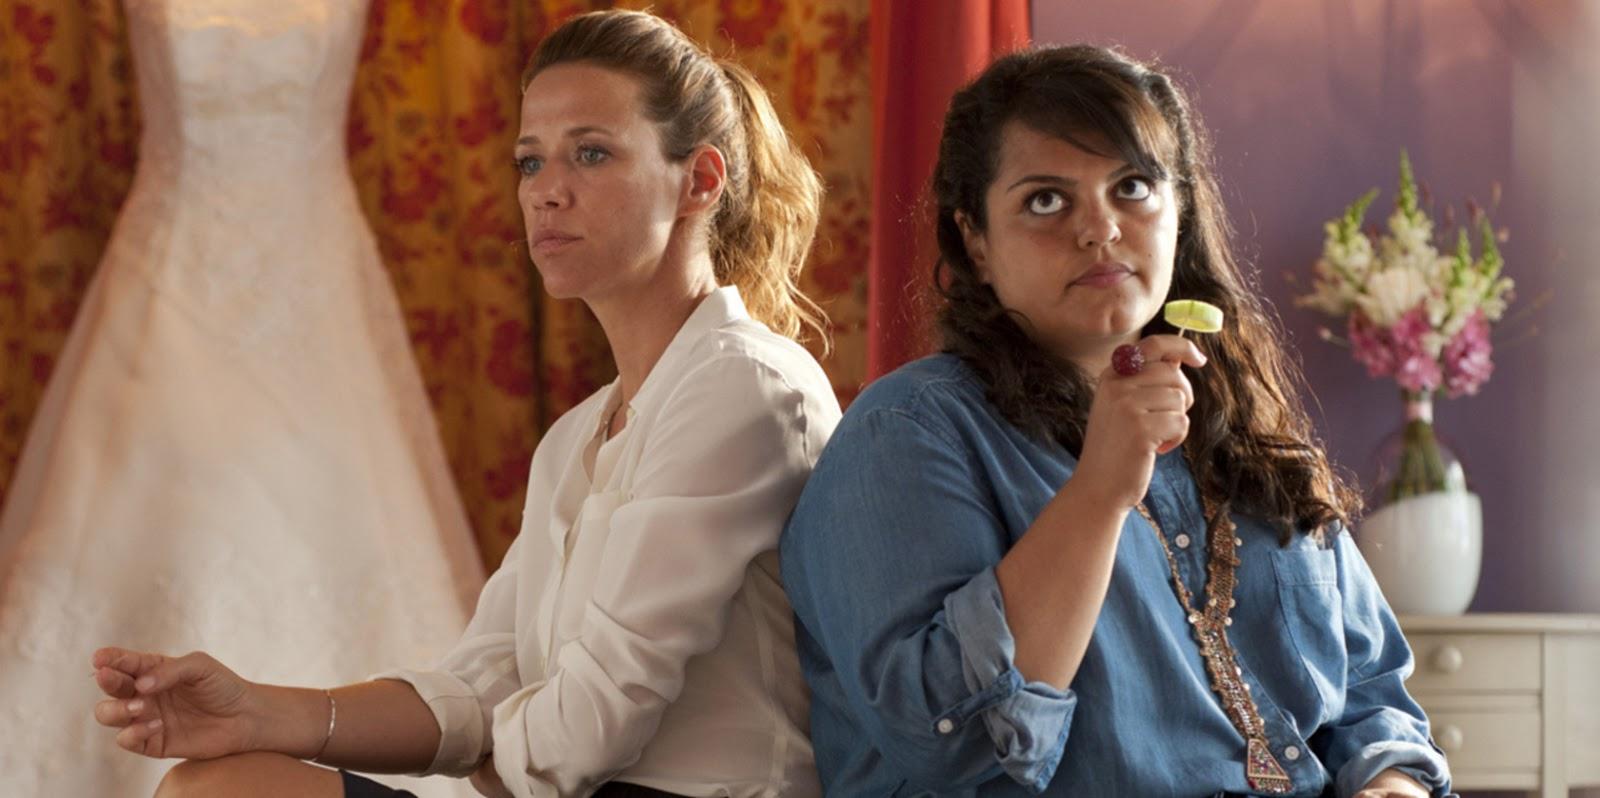 Wedding Planner Mystery.The Wedding Planner Movie Streaming Cassandras Dream Full Cast